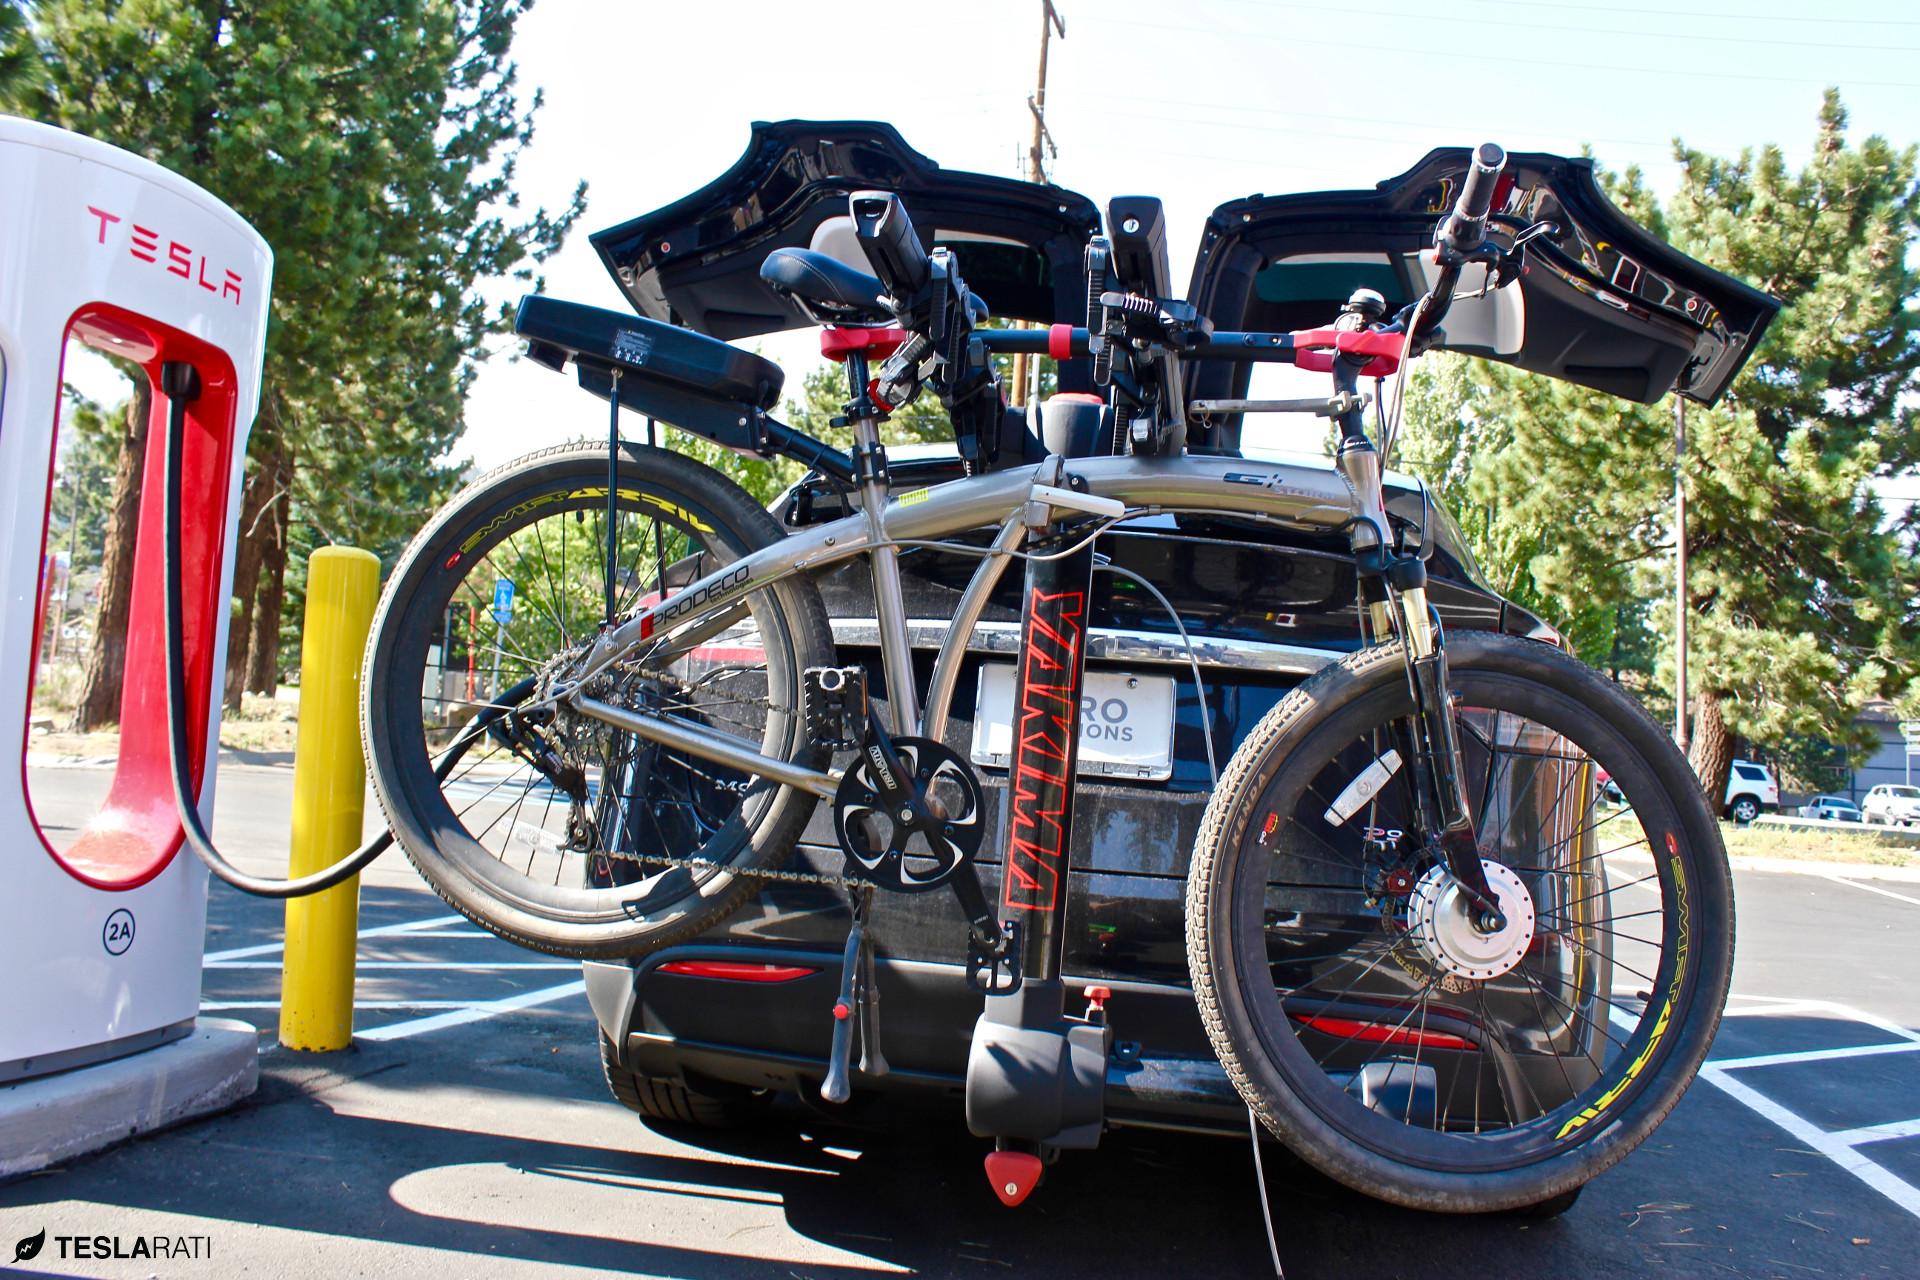 model-x-bike-rack-hitch-prodeco-3